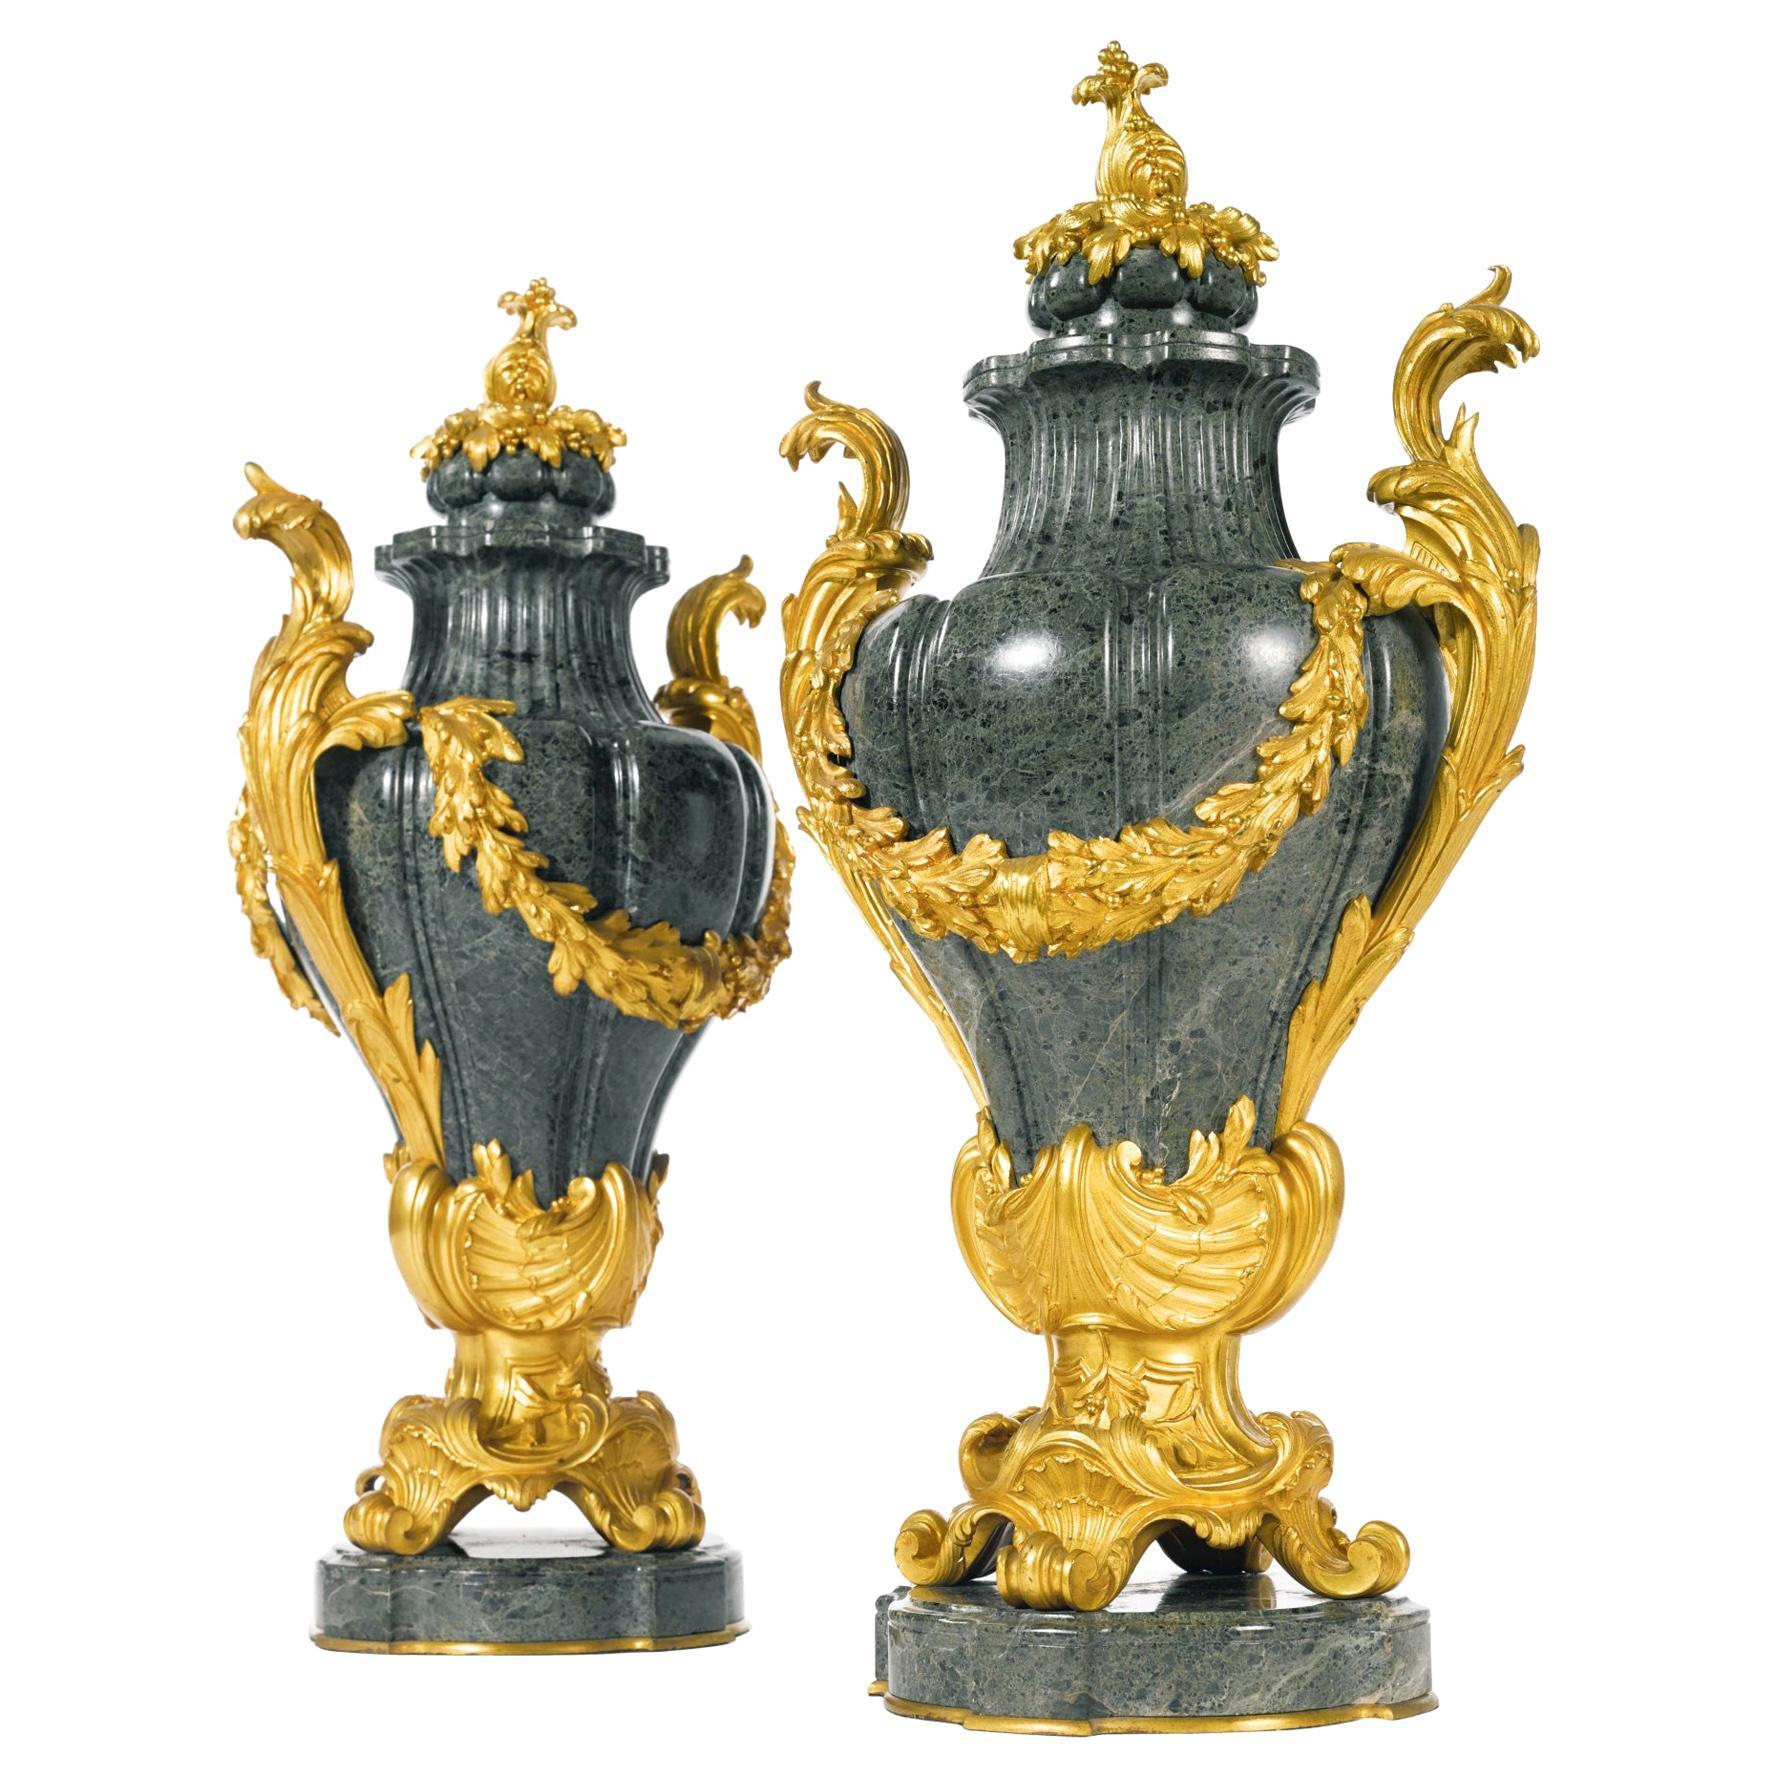 Pair of Ormolu-Mounted Green Marble Urns by Barbedienne